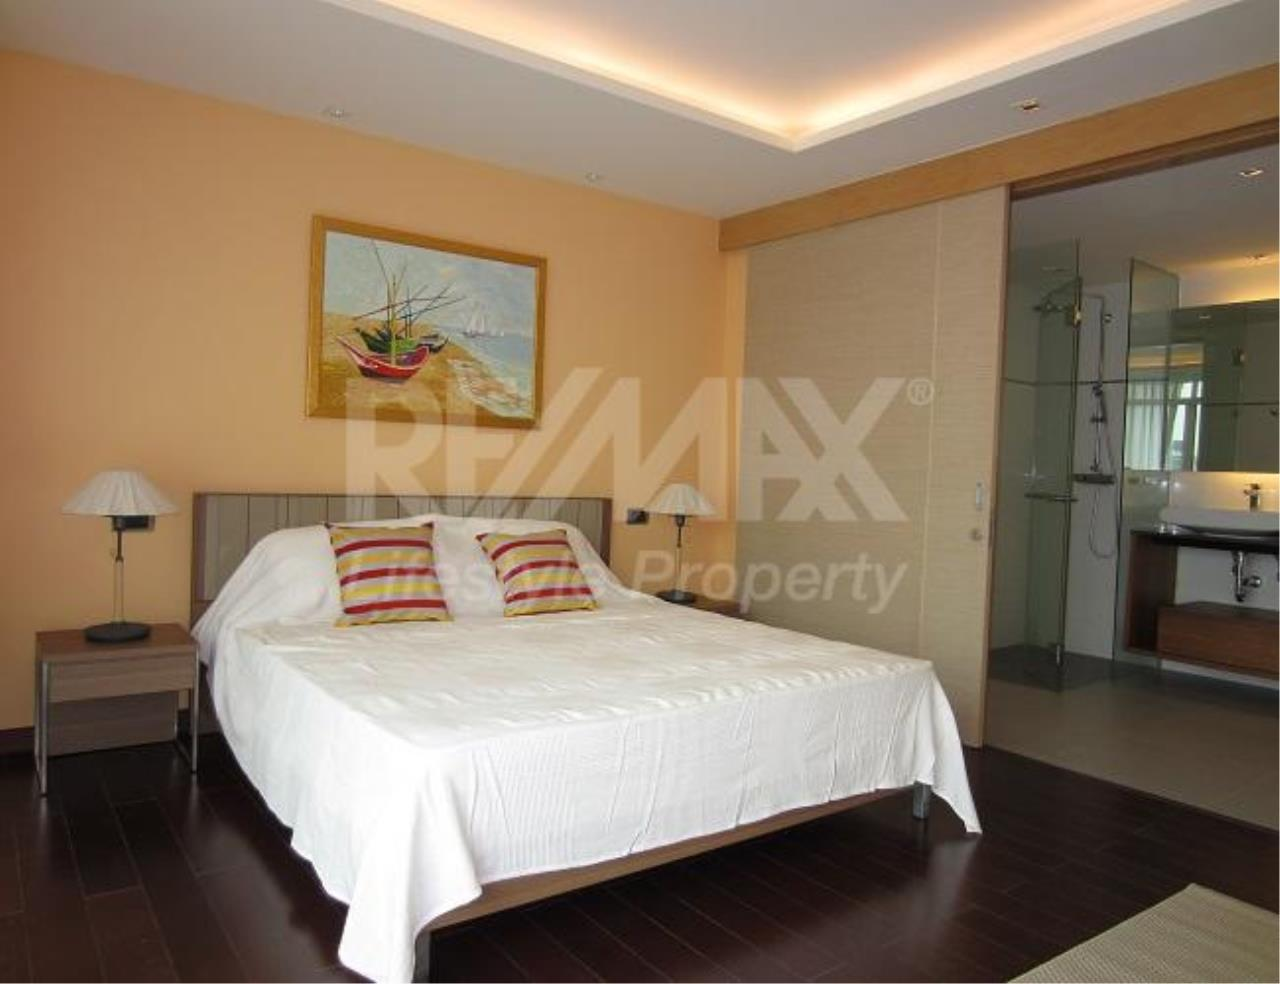 RE/MAX LifeStyle Property Agency's Le Monaco Residence Ari 2